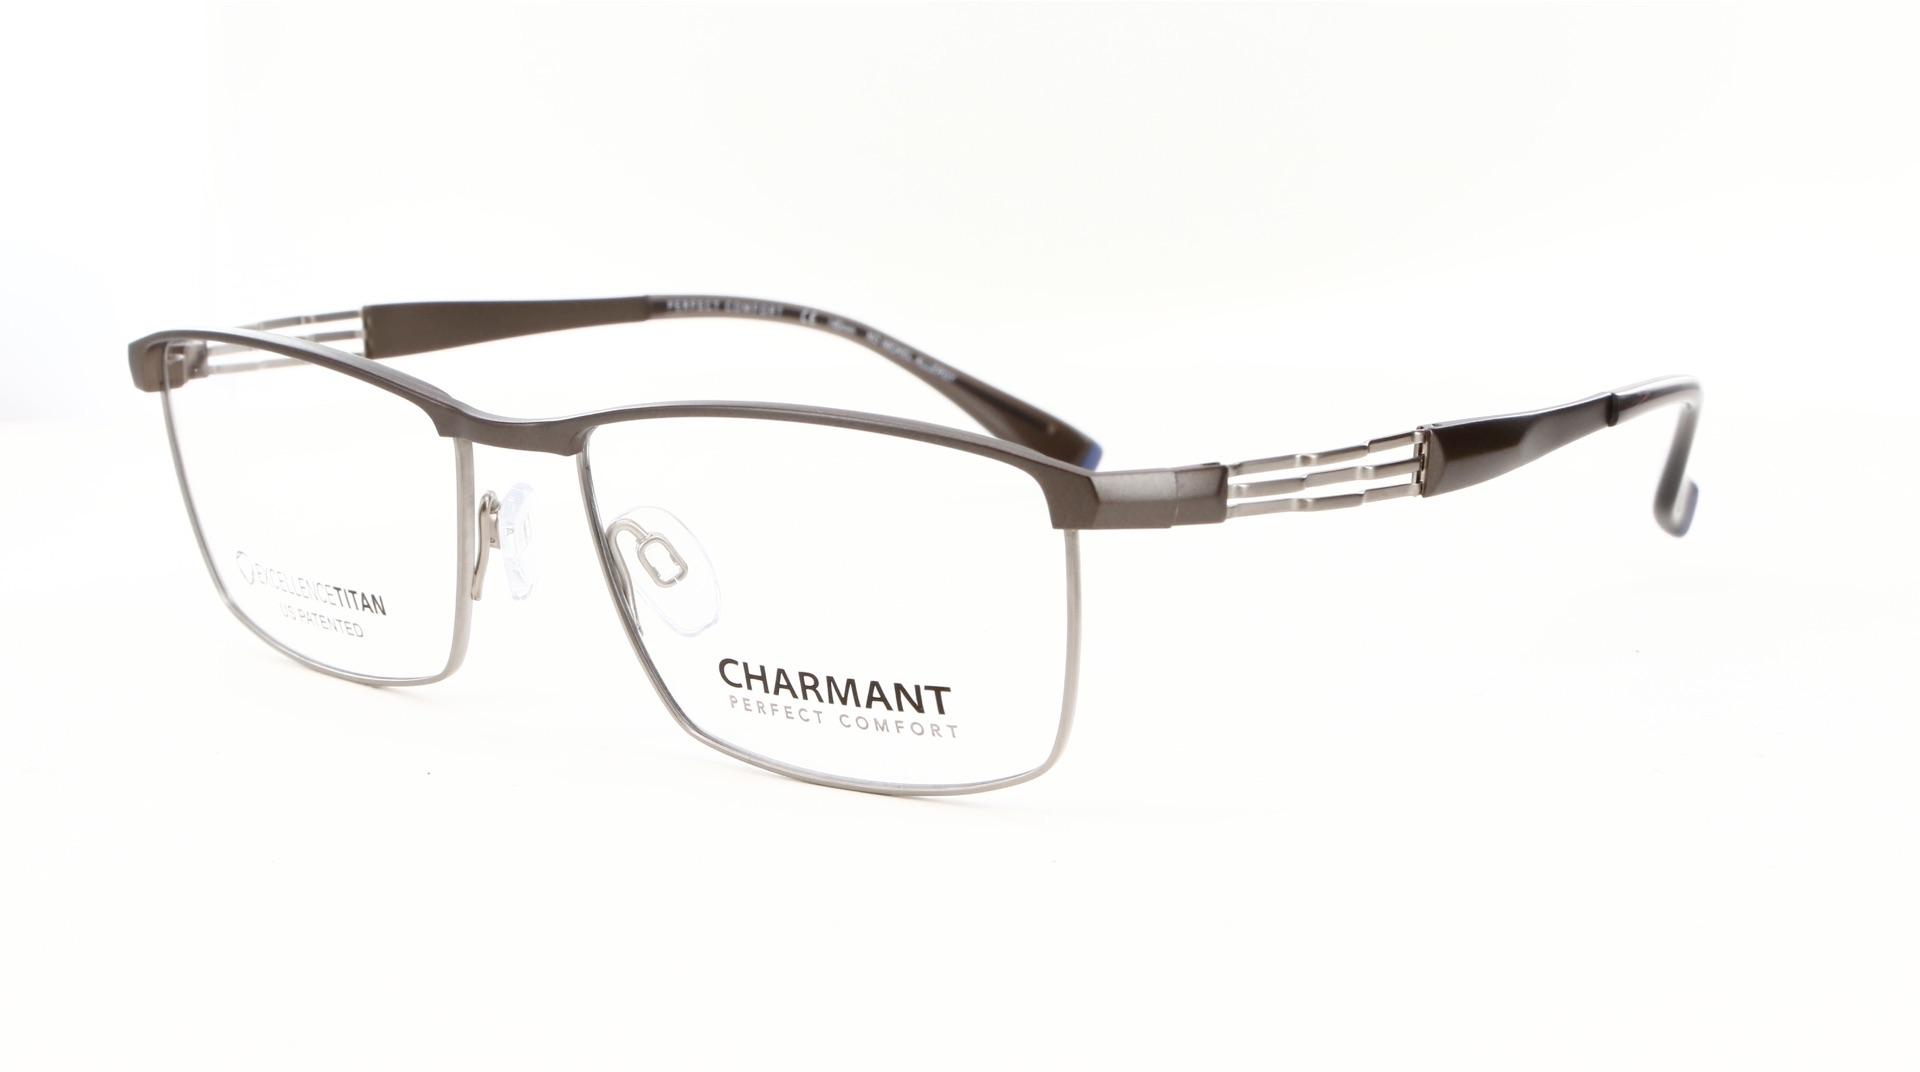 Charmant - ref: 76481